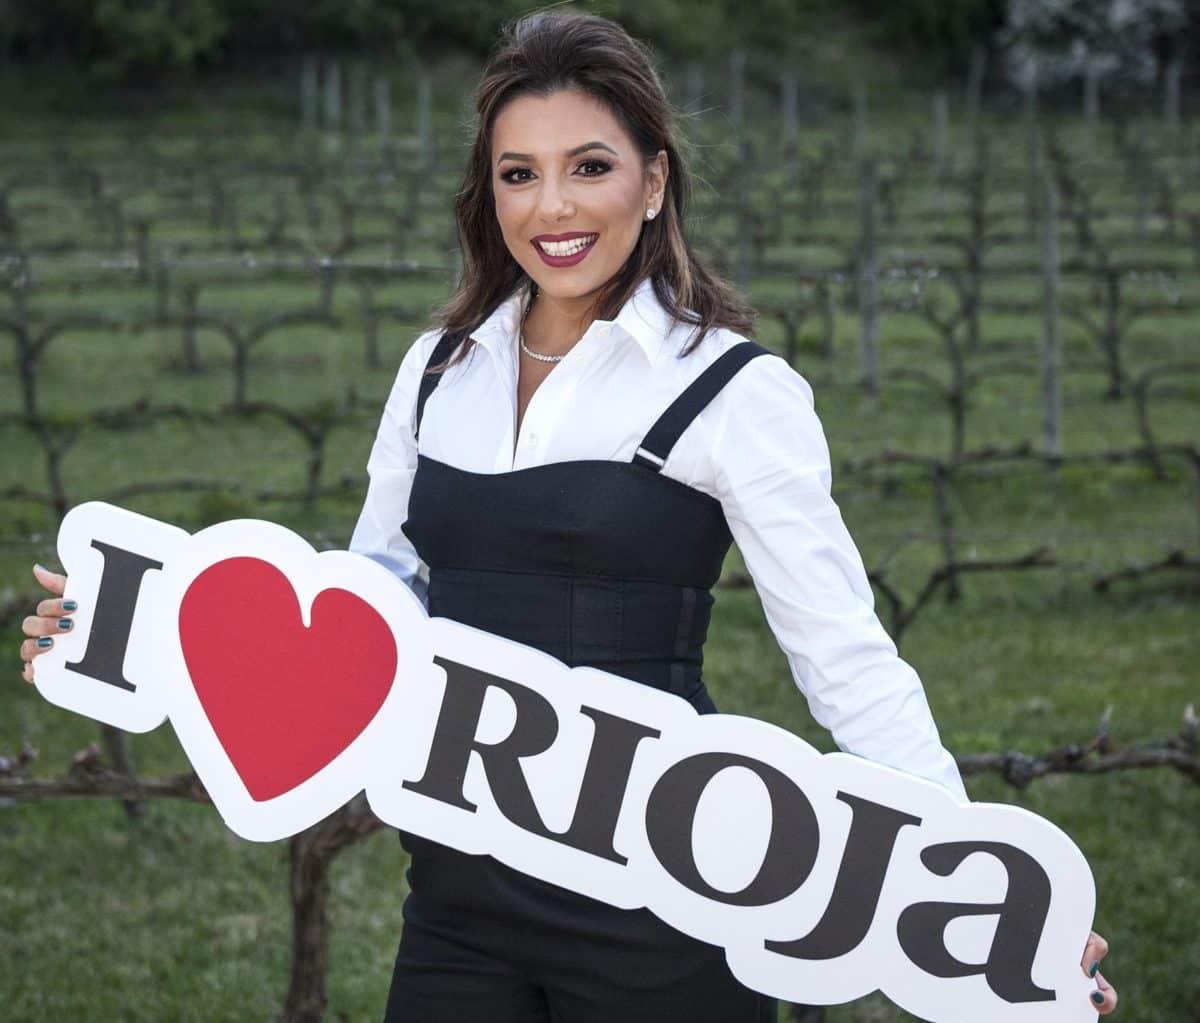 Eva Longoria cumple su promesa y visita la DOC Rioja 1